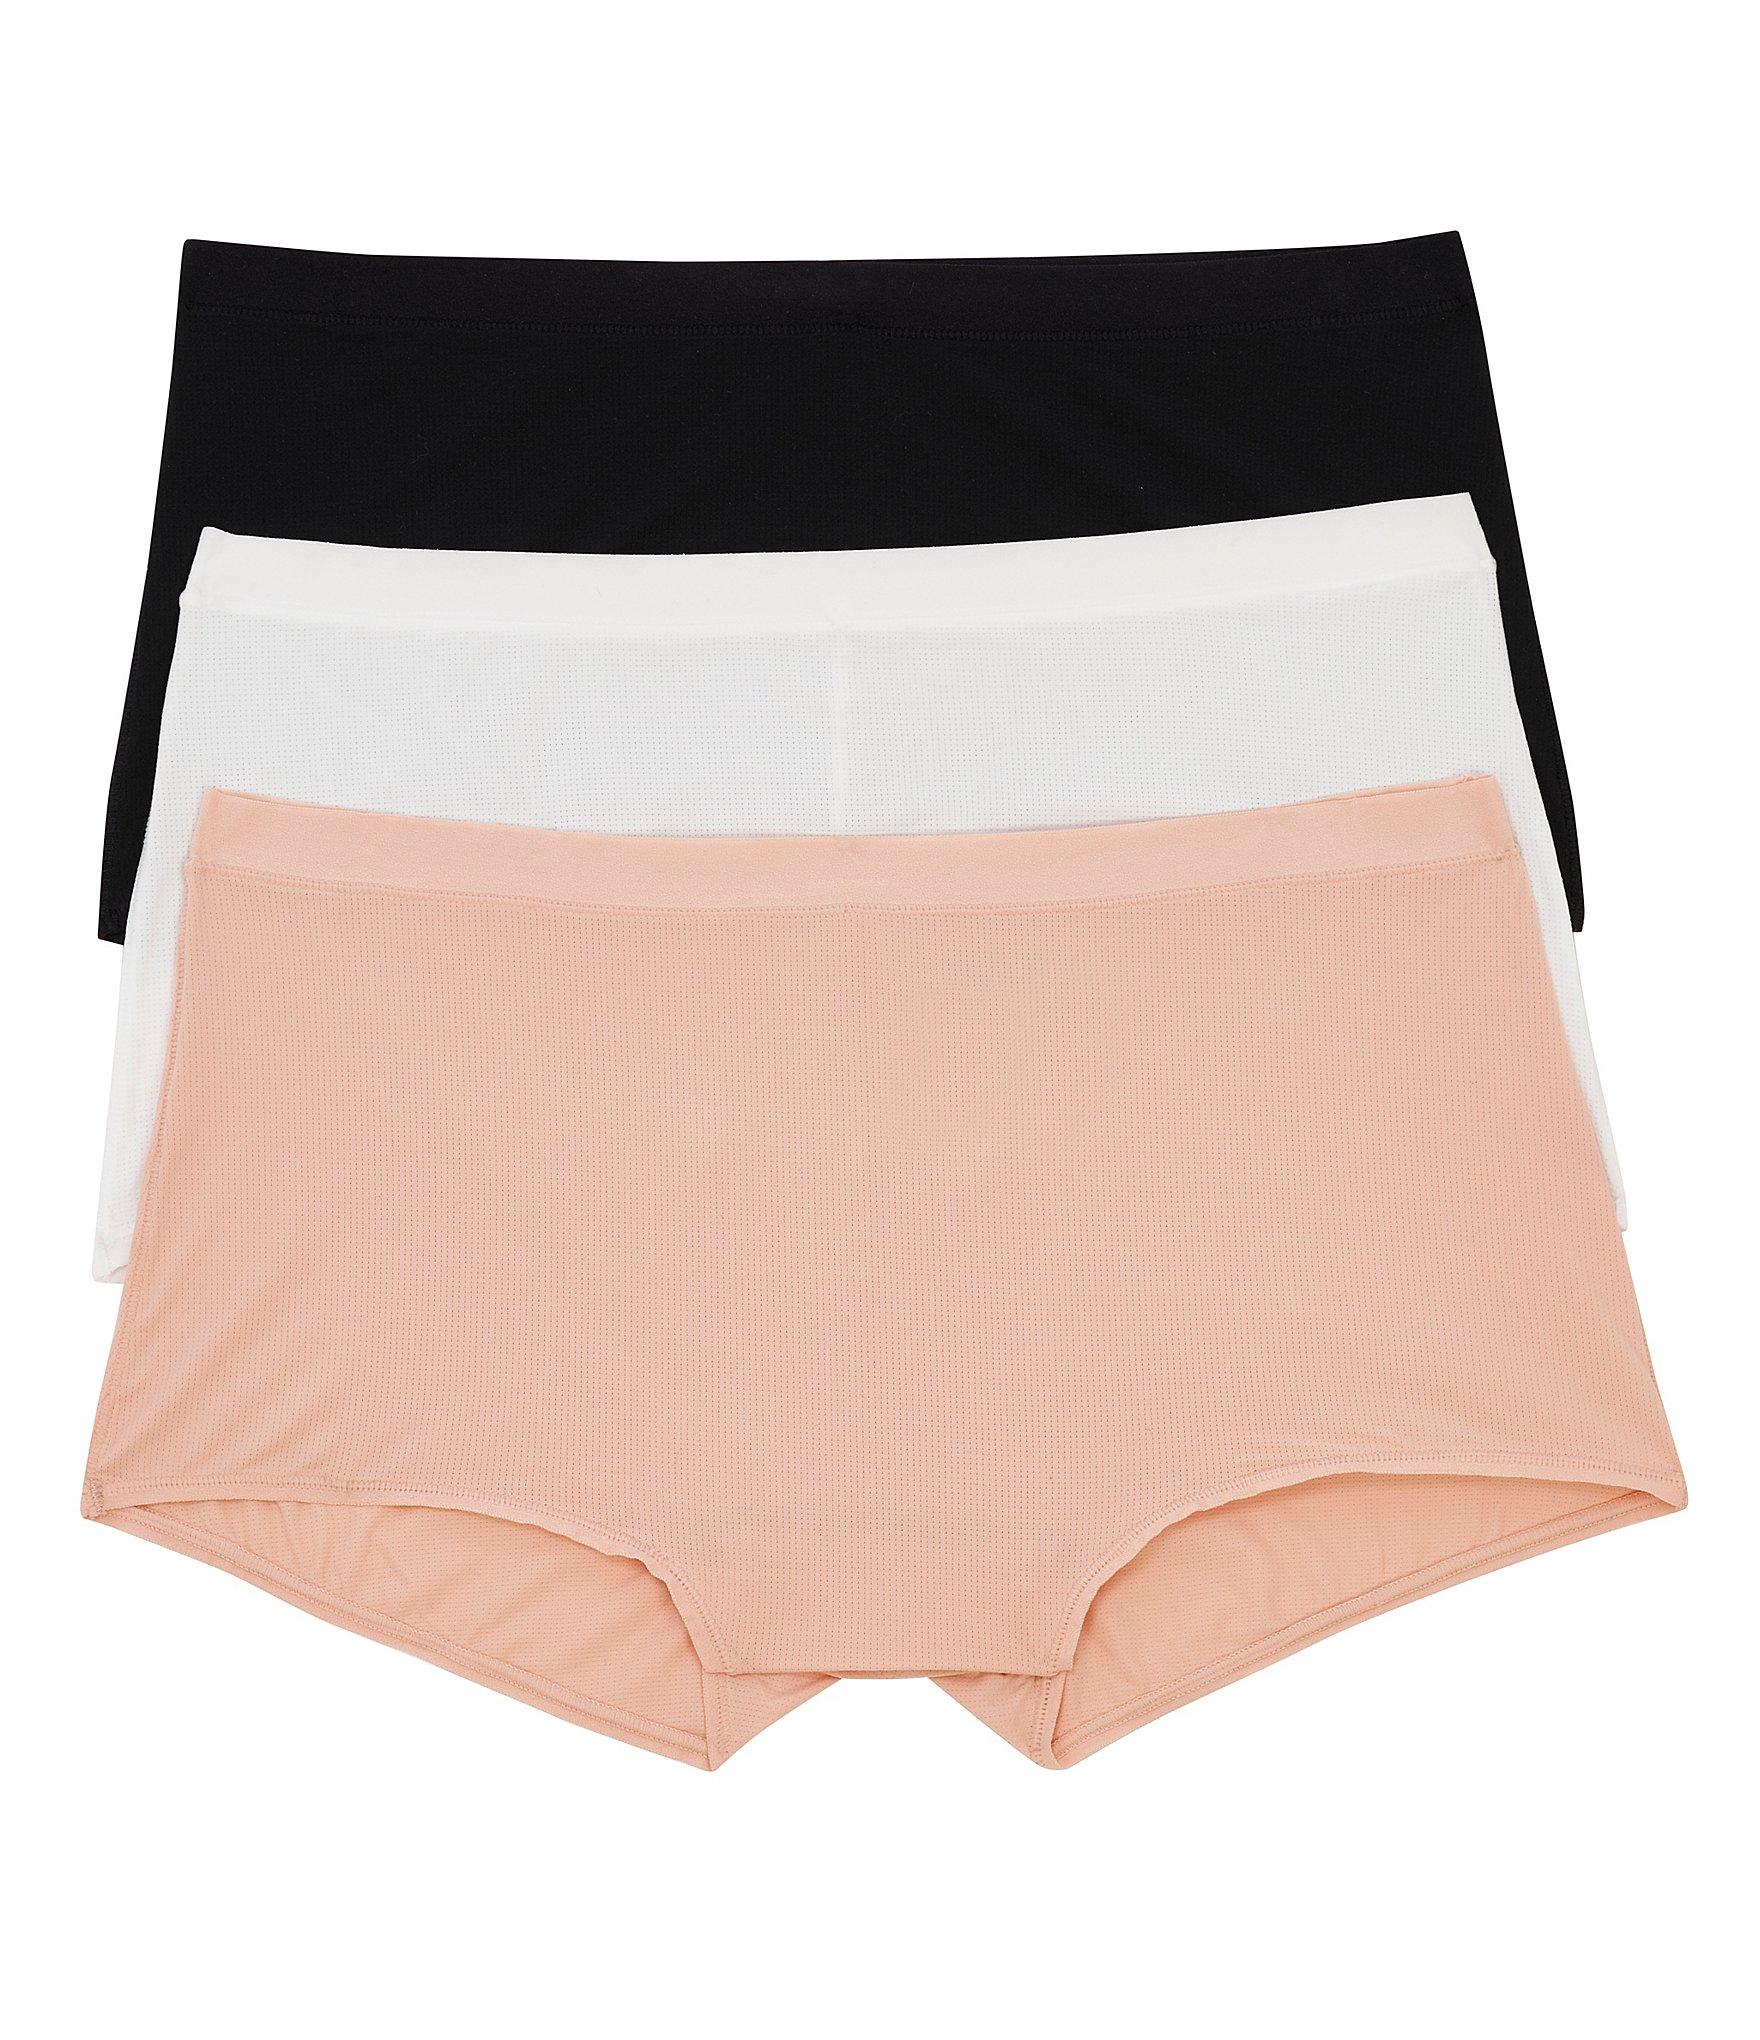 2 Pairs Women Seamless Boyshorts Boyleg Panties Microfiber Underwear Beige Small